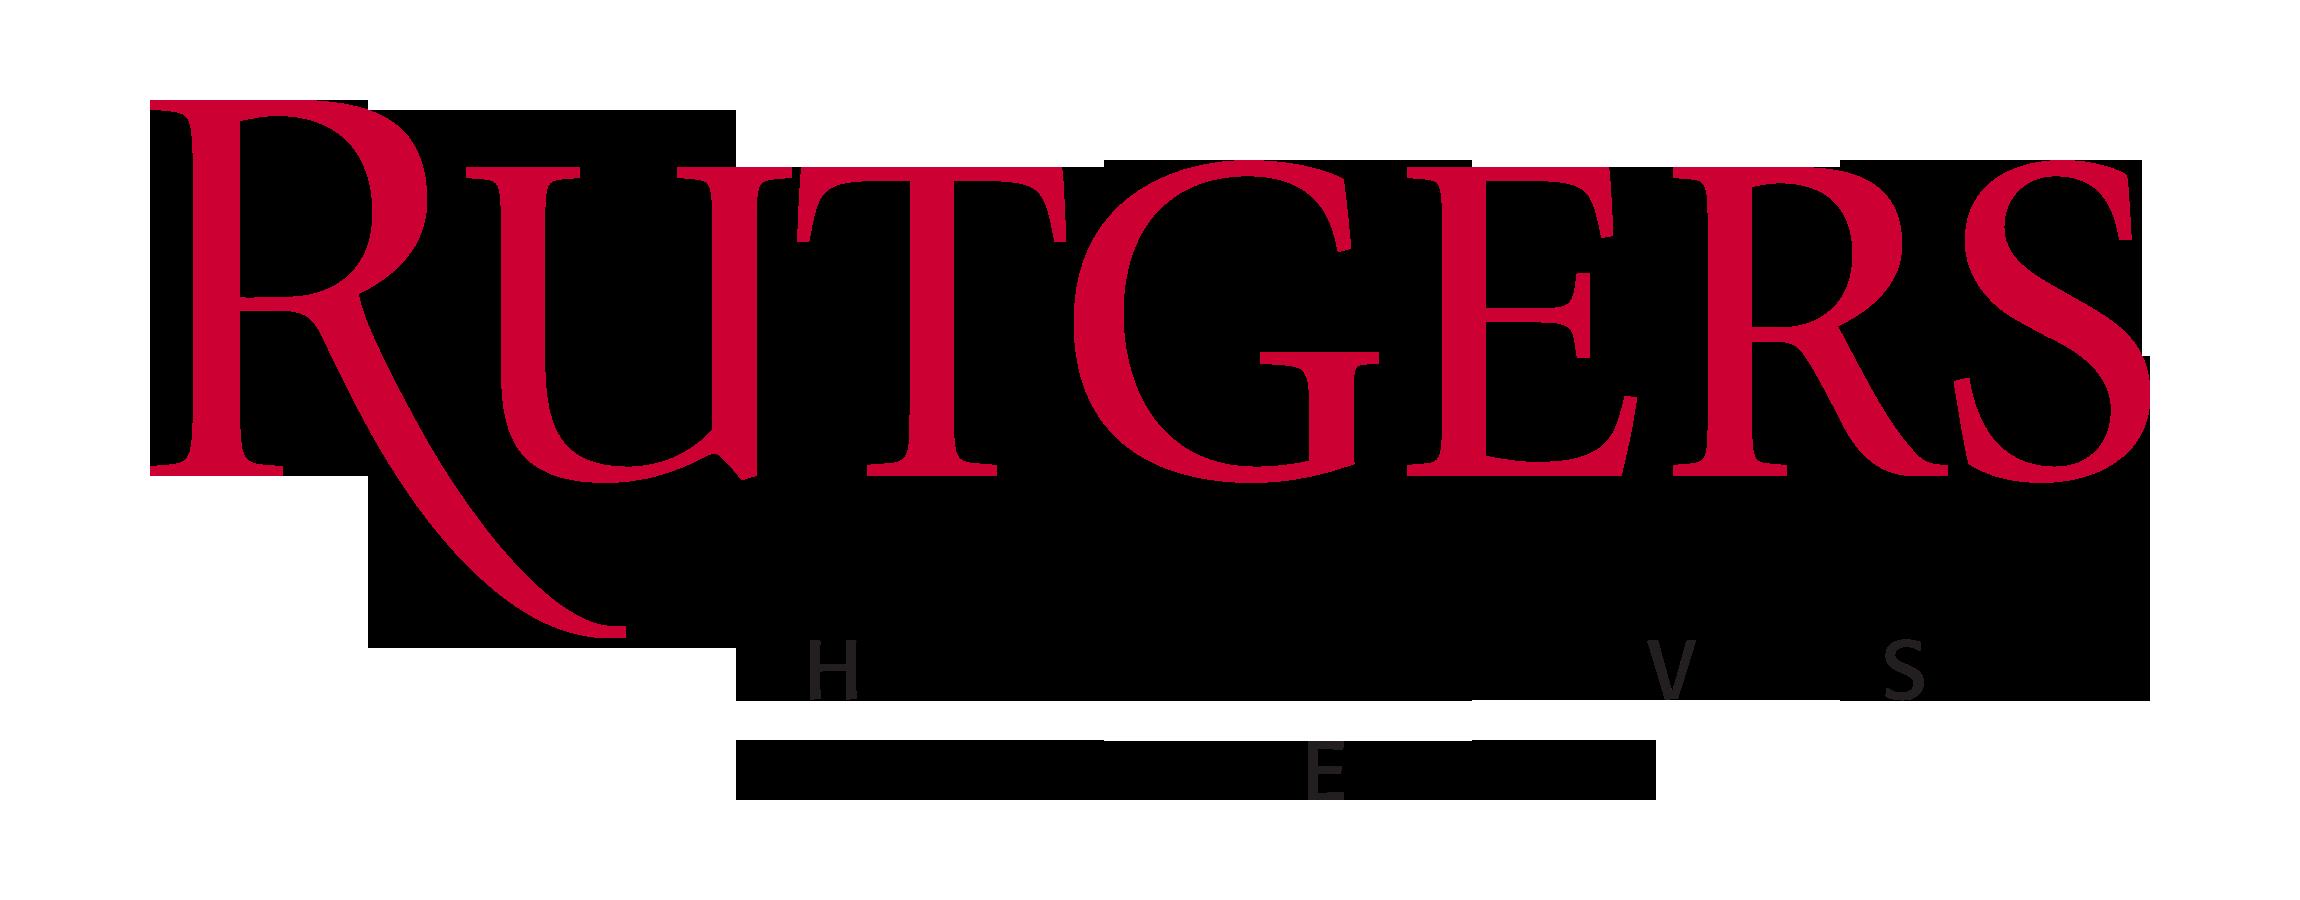 Rutgers university logo rutgers university symbol meaning rutgers university logo buycottarizona Image collections